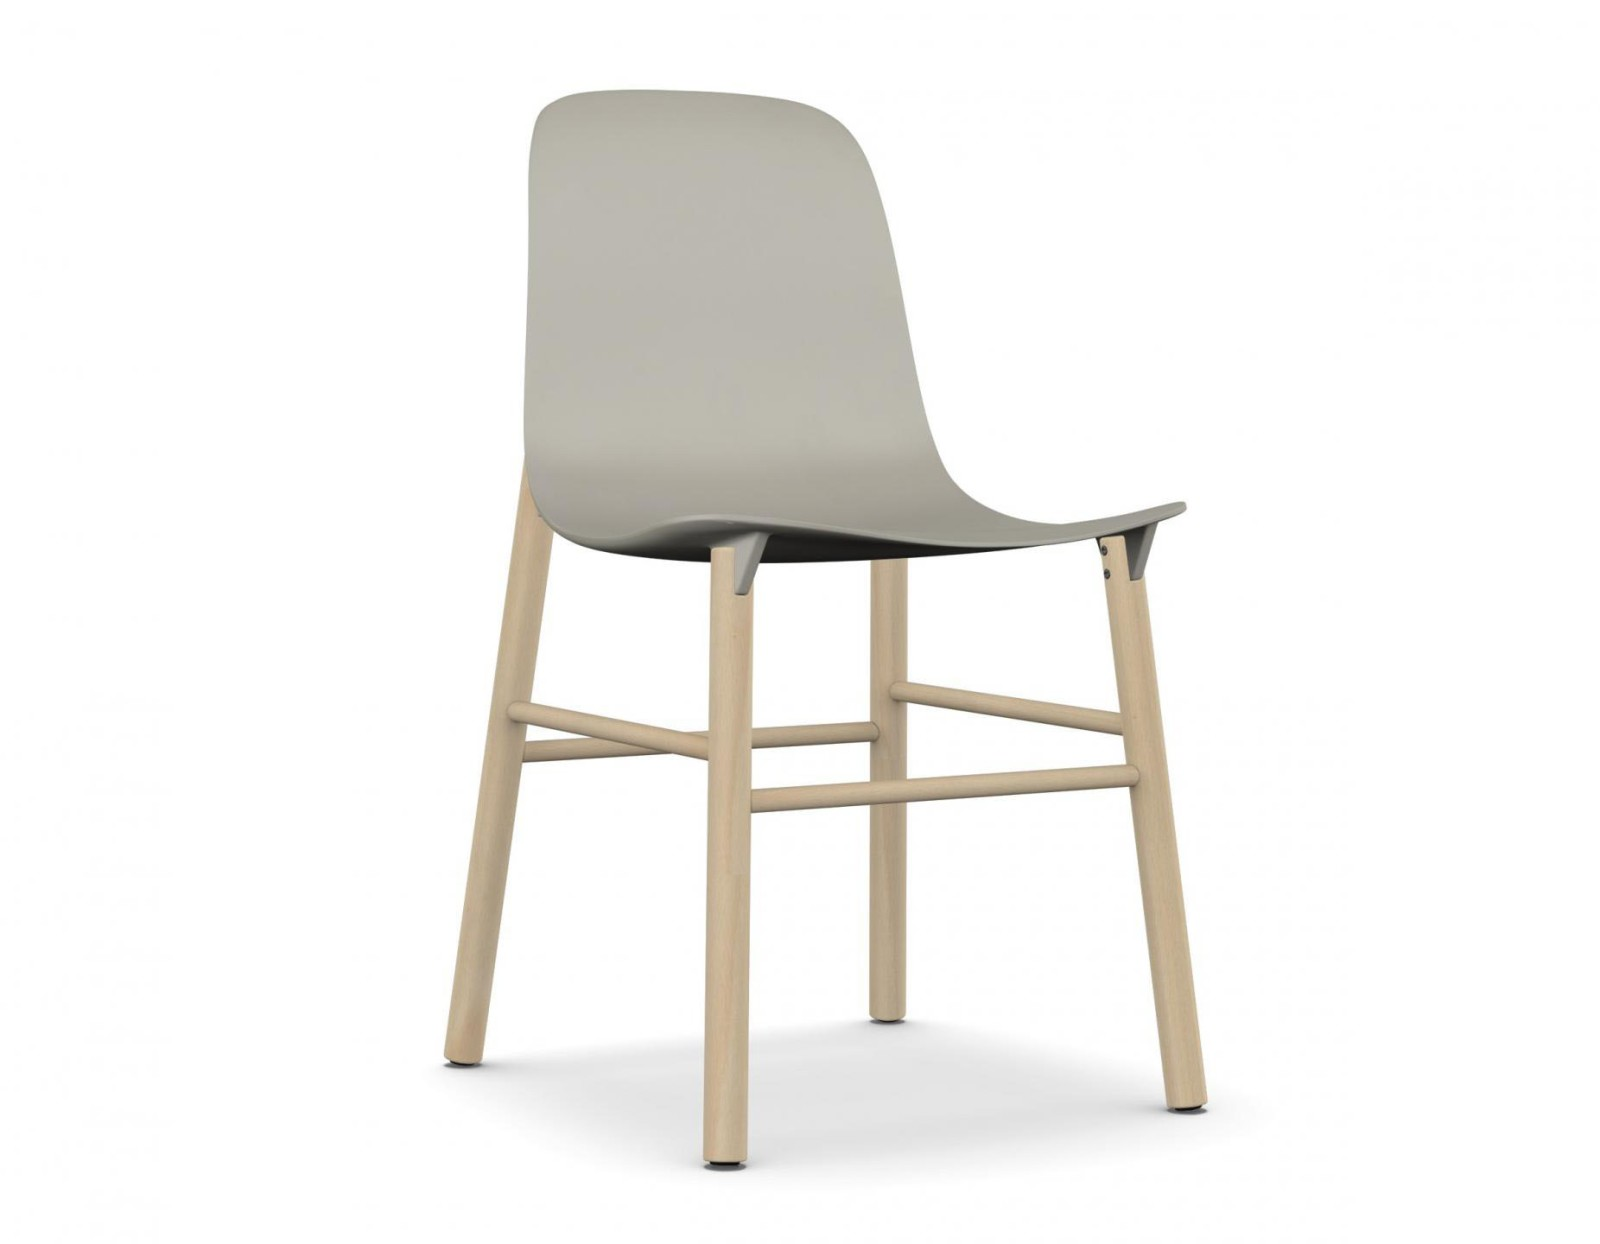 Sharky Wood base - Polyurethane seat Beige, Beech